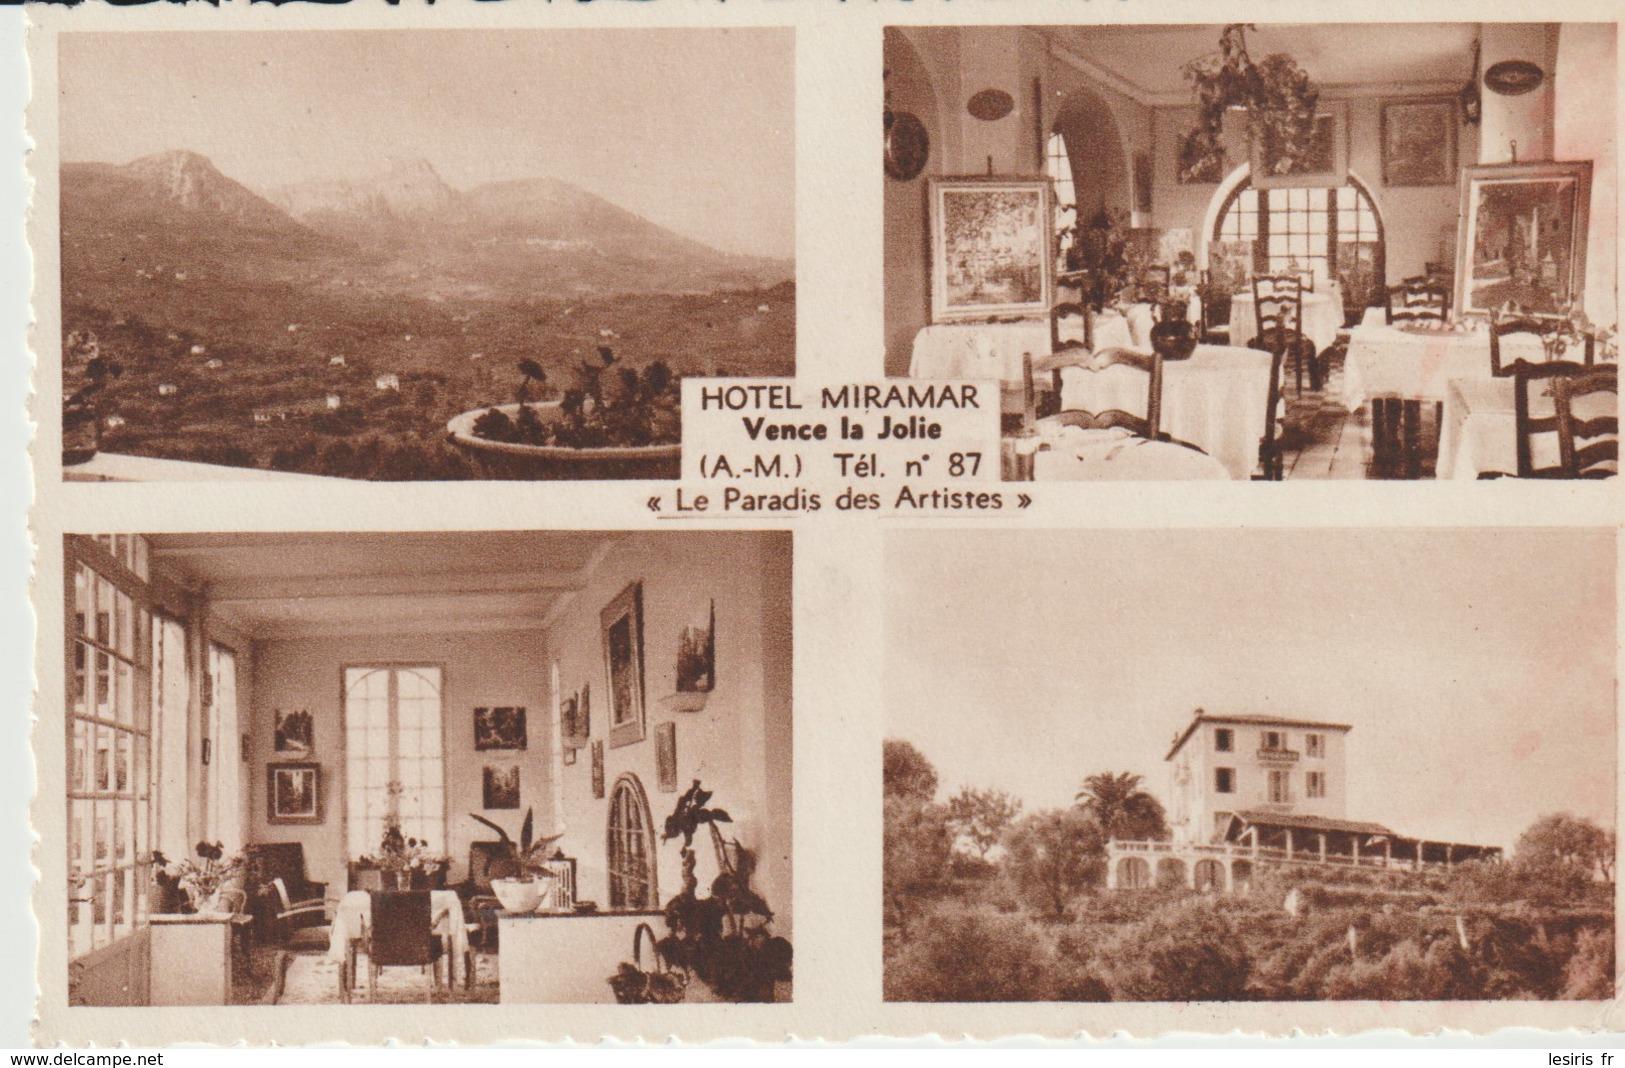 C.P.A. - VENCE LA JOLIE - HOTEL MIRAMAR - 4 VUES -LE PARADIS DES ARTISTES - J. LE MARIGNY - - Vence